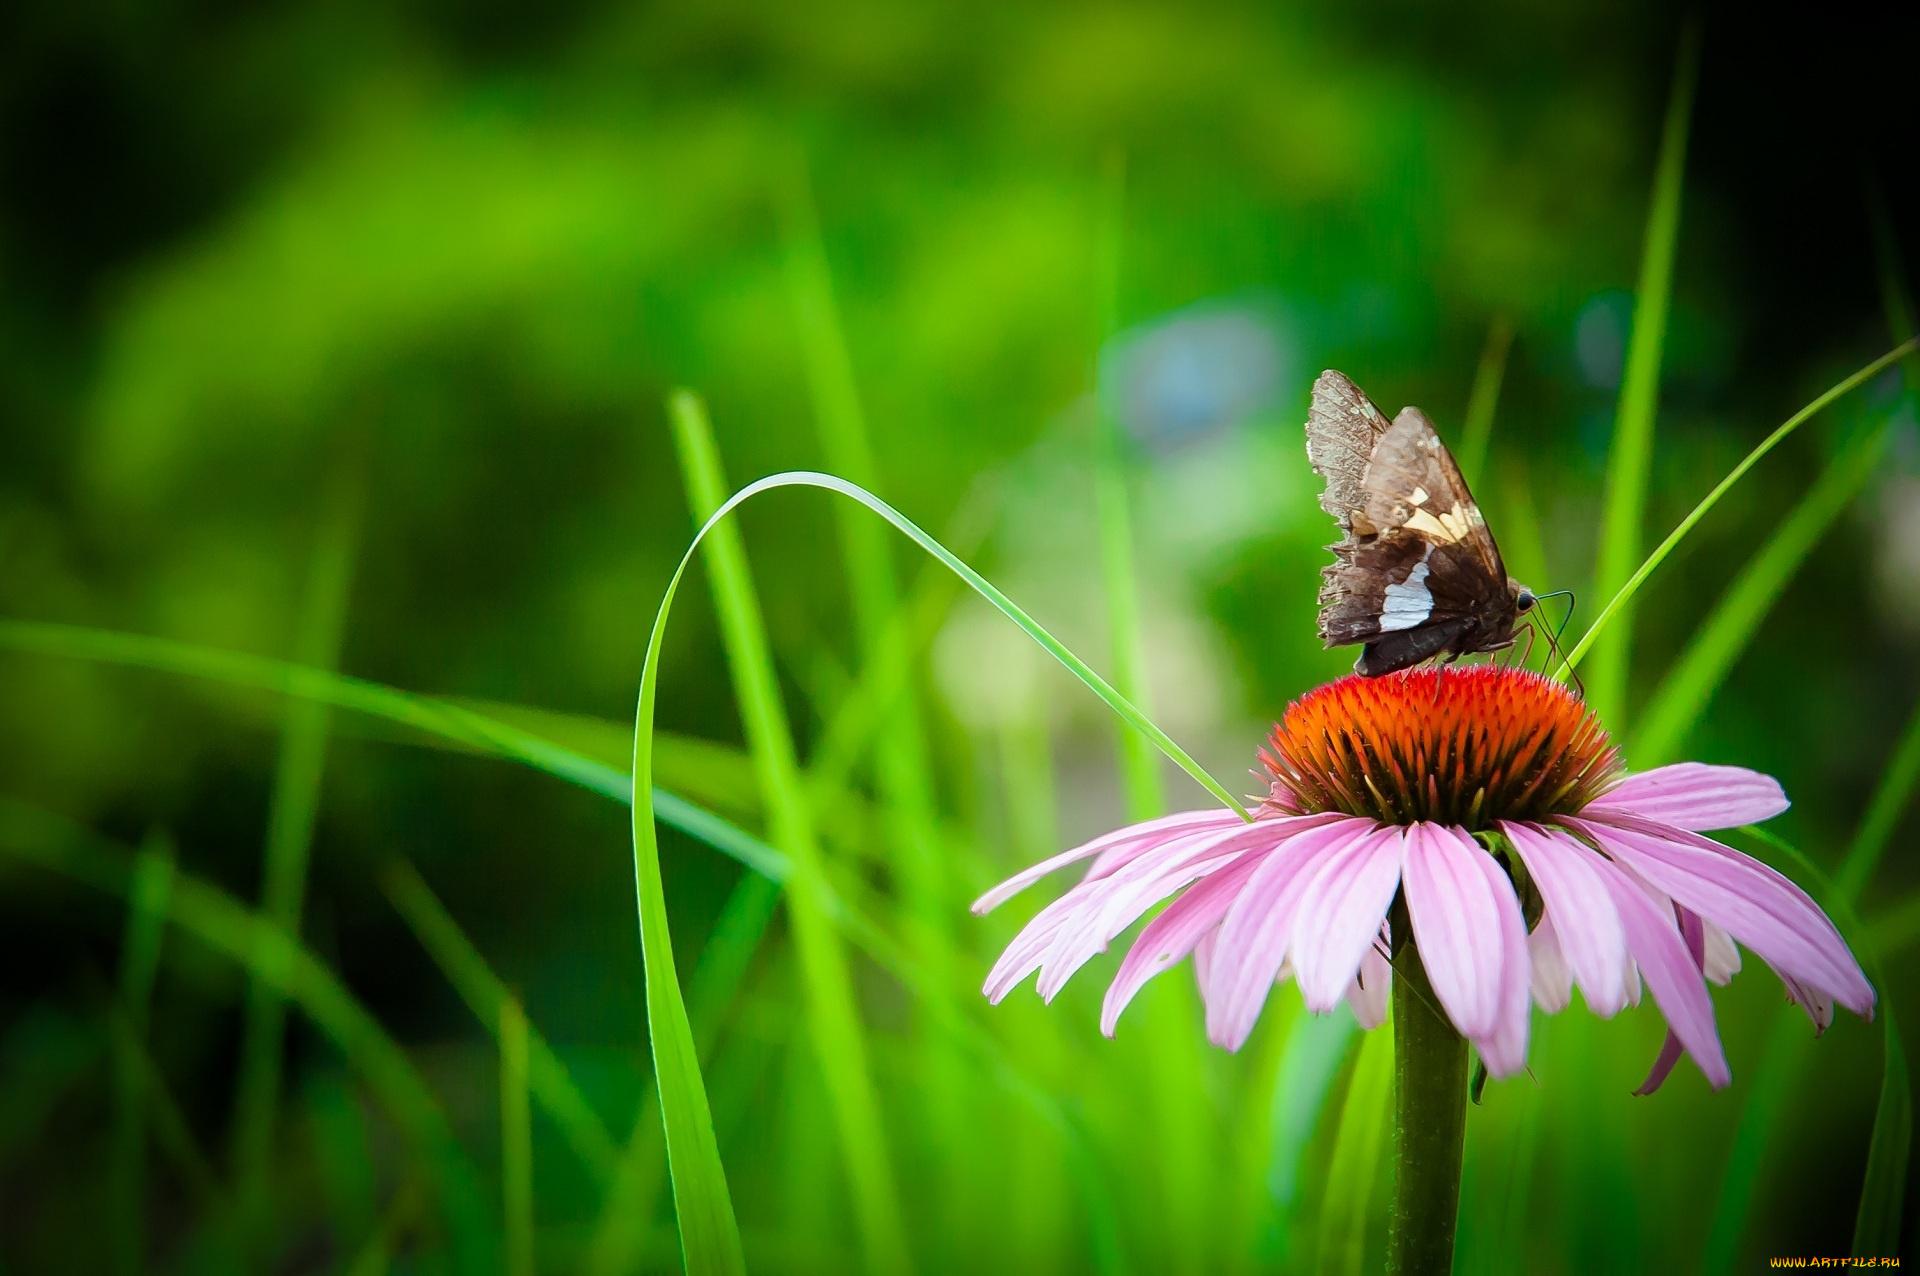 бабочка на зеленой траве  № 1396202 бесплатно